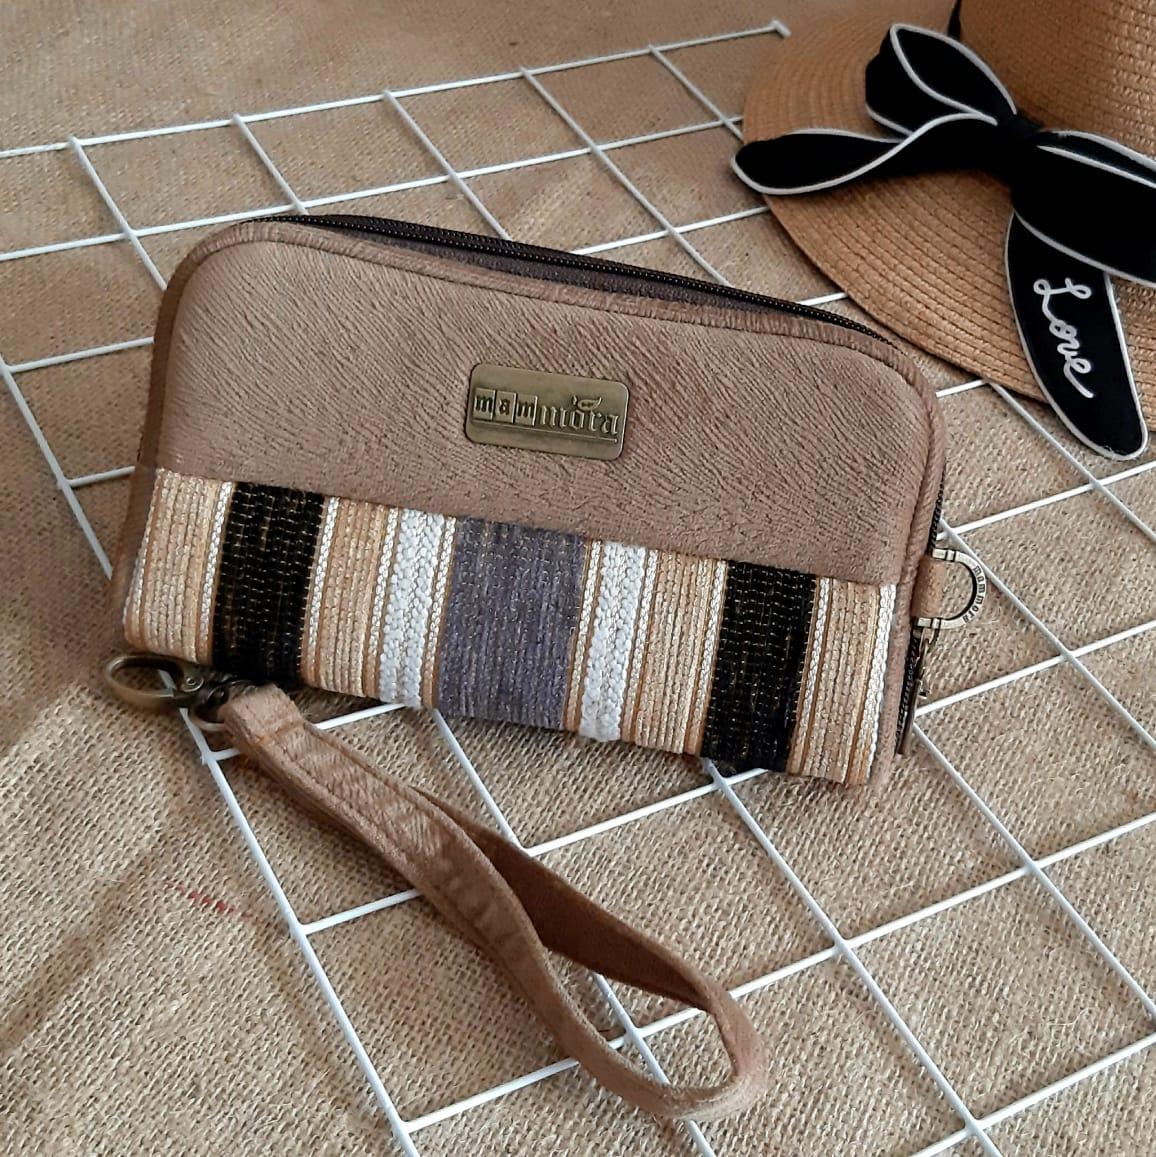 dompet hp organizer wanita mammora sw smart wallet ethnic handmade